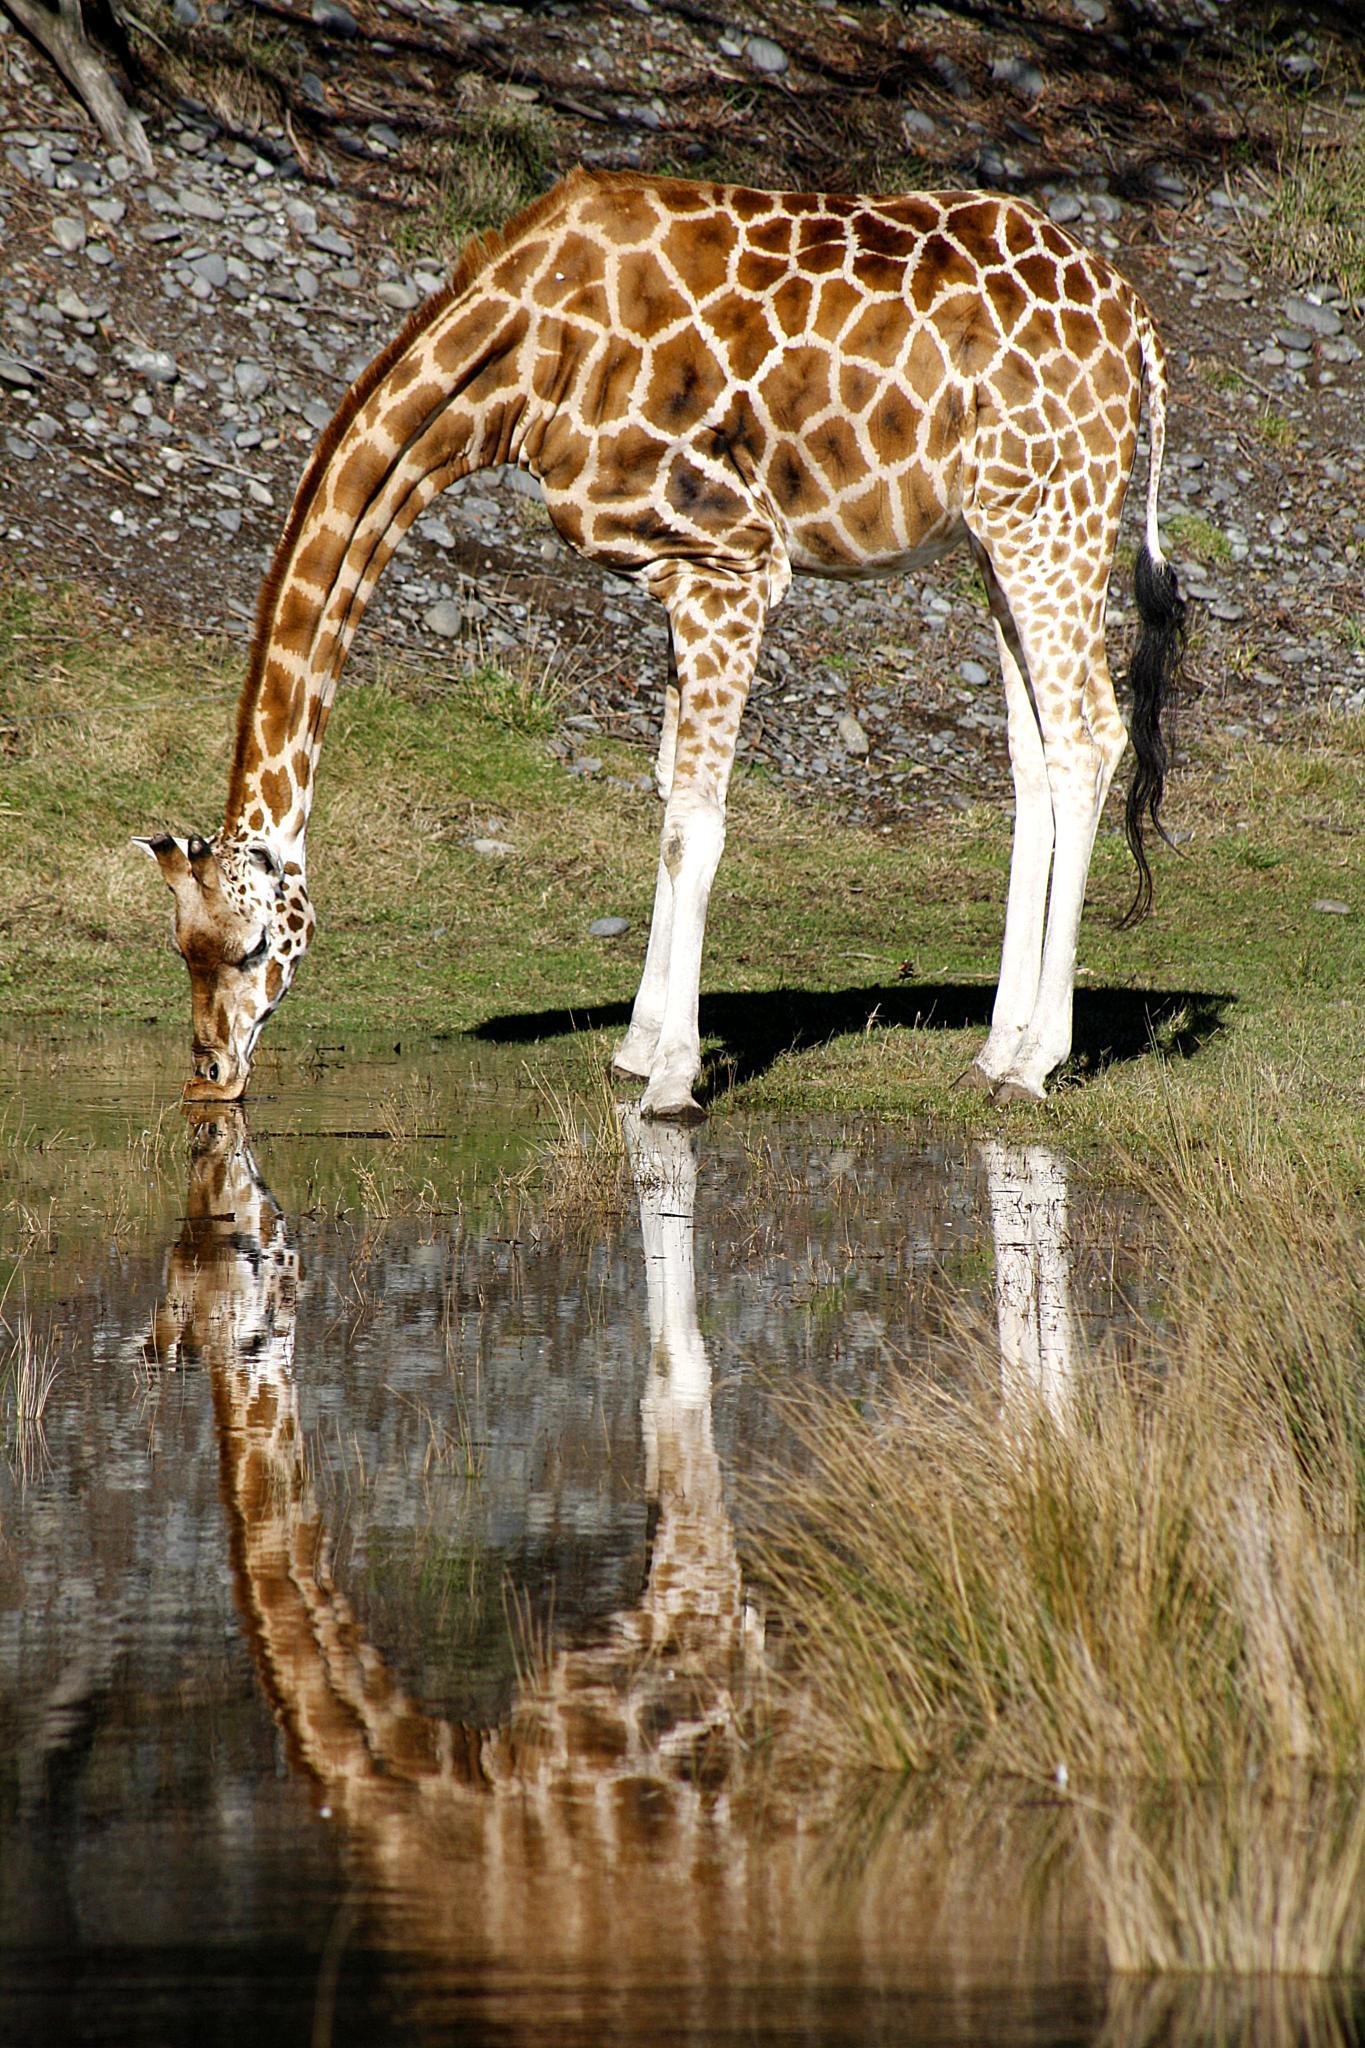 Giraffe Reflection by Phil Le Cren